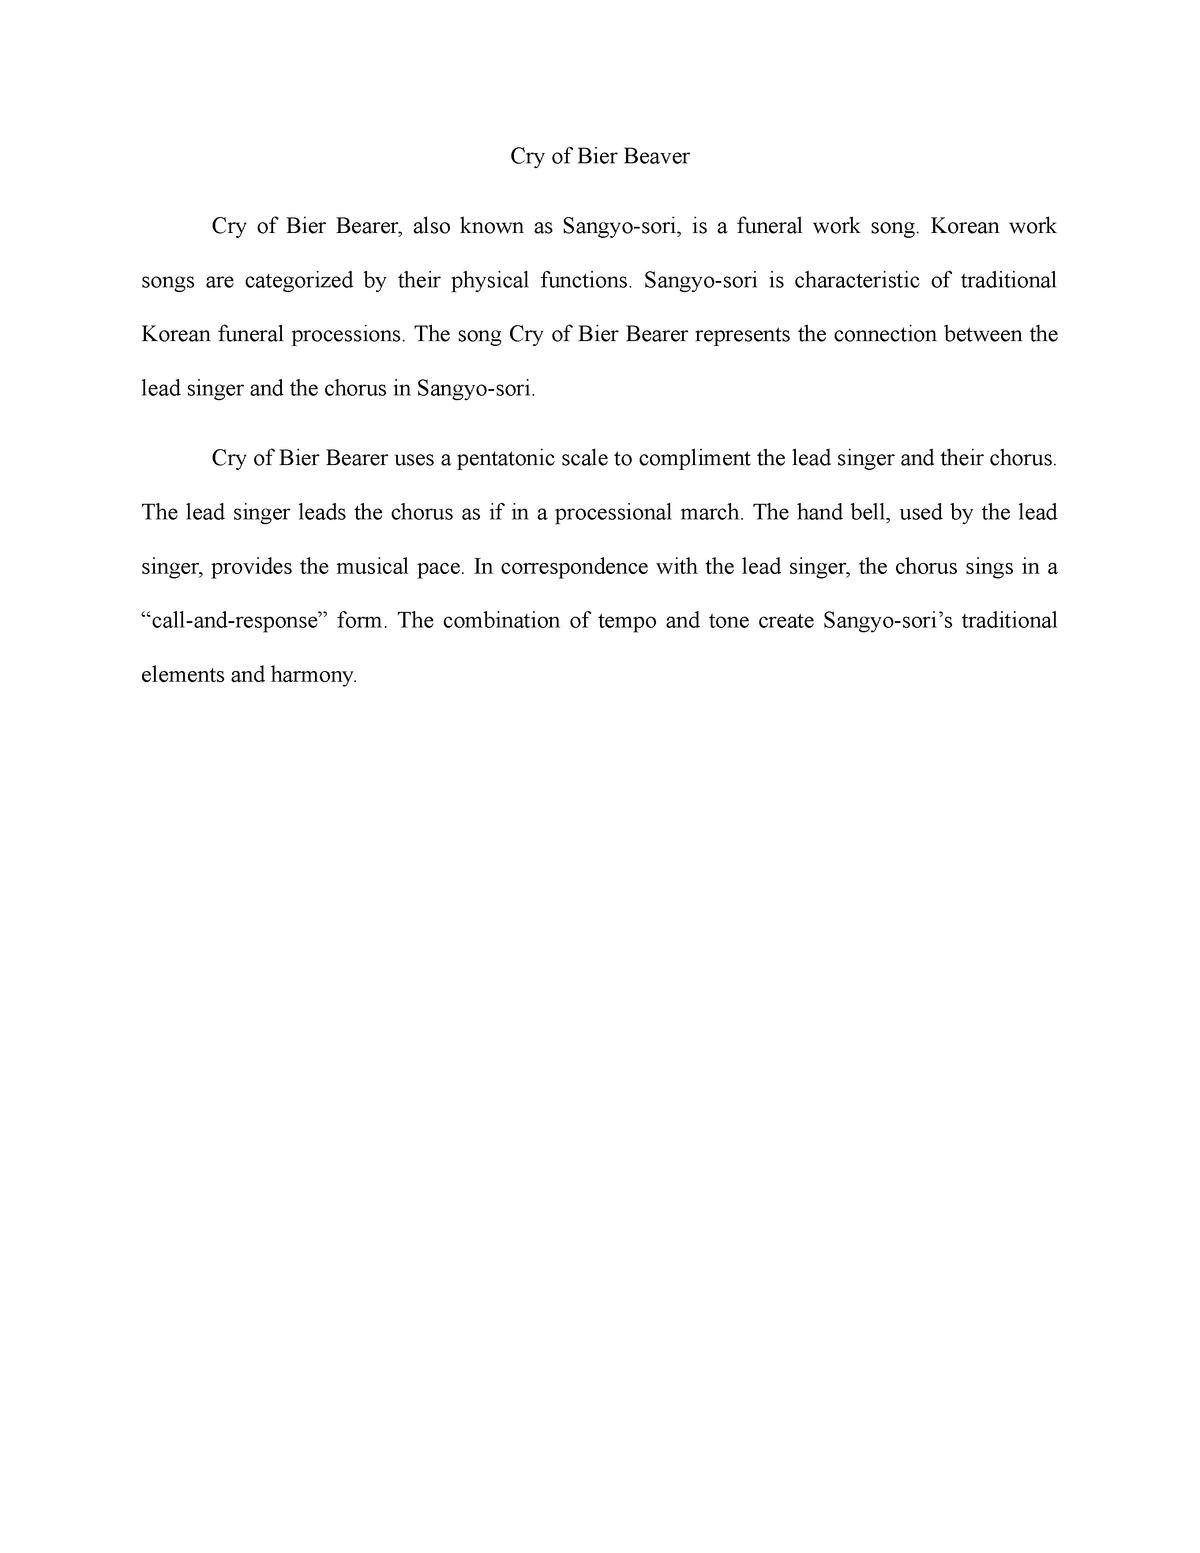 Korean paper assignment - MUSI 3583: Traditional World Music - StuDocu